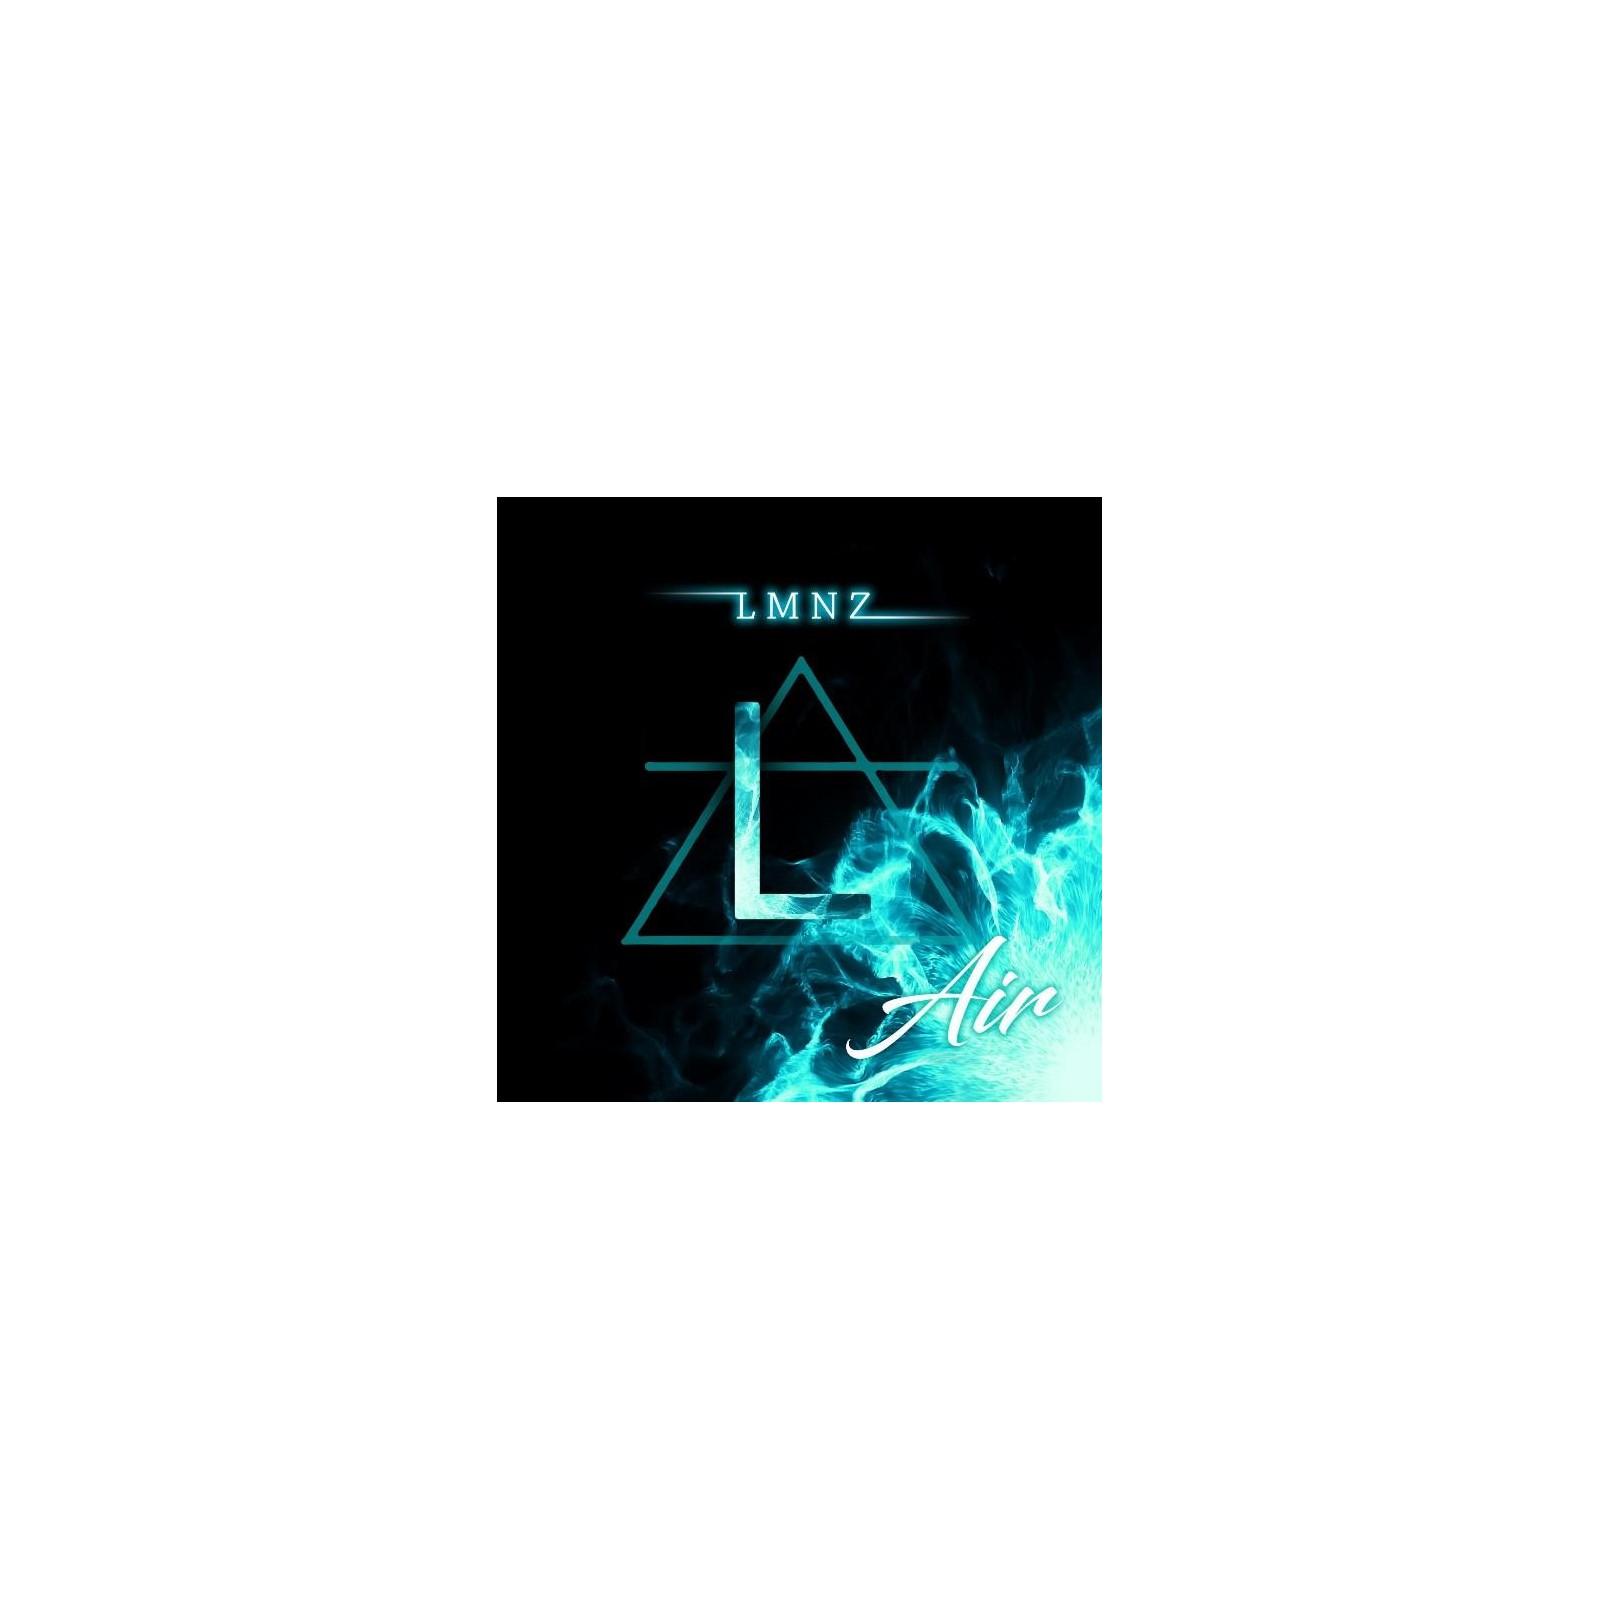 Upcoming: LMNZ - Air